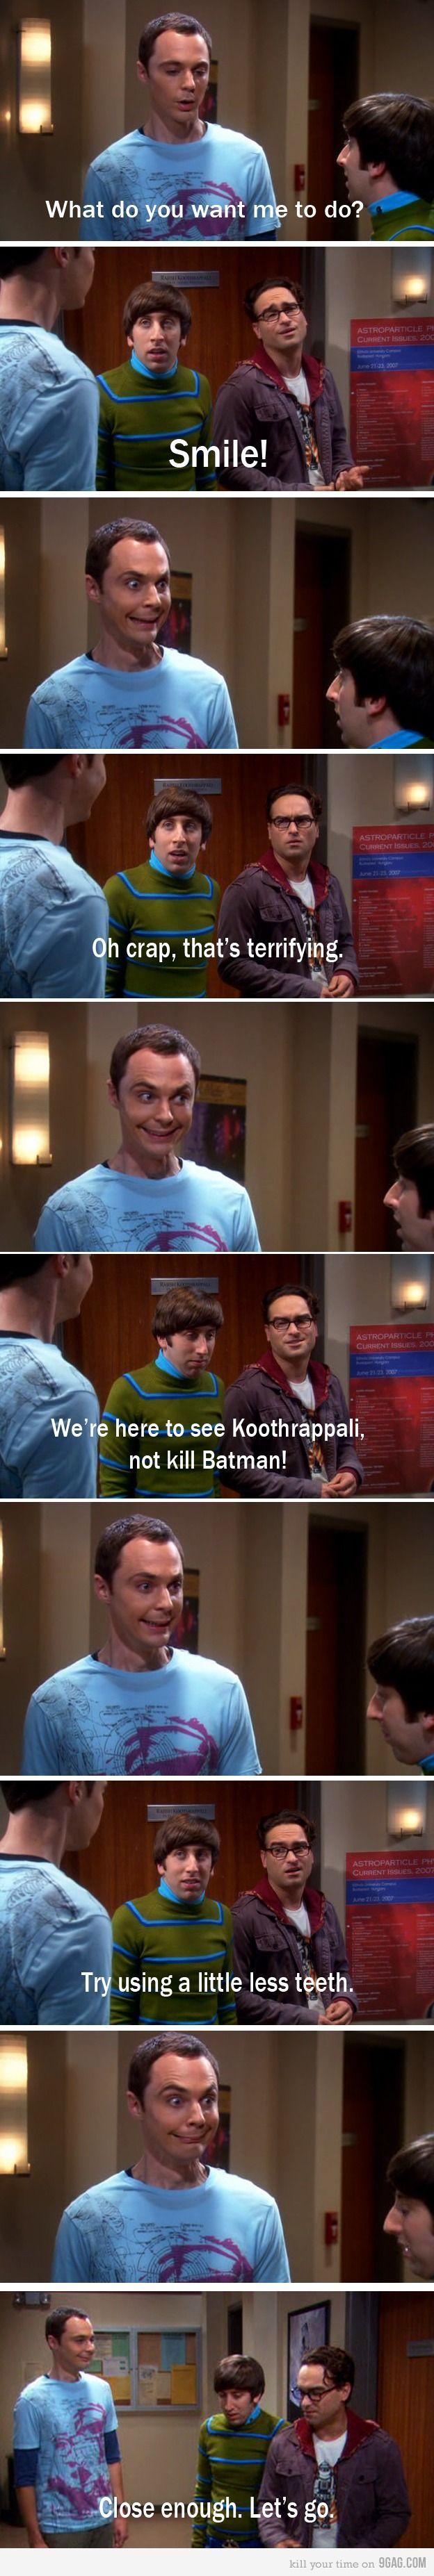 Sheldon Cooper, you crack me up.